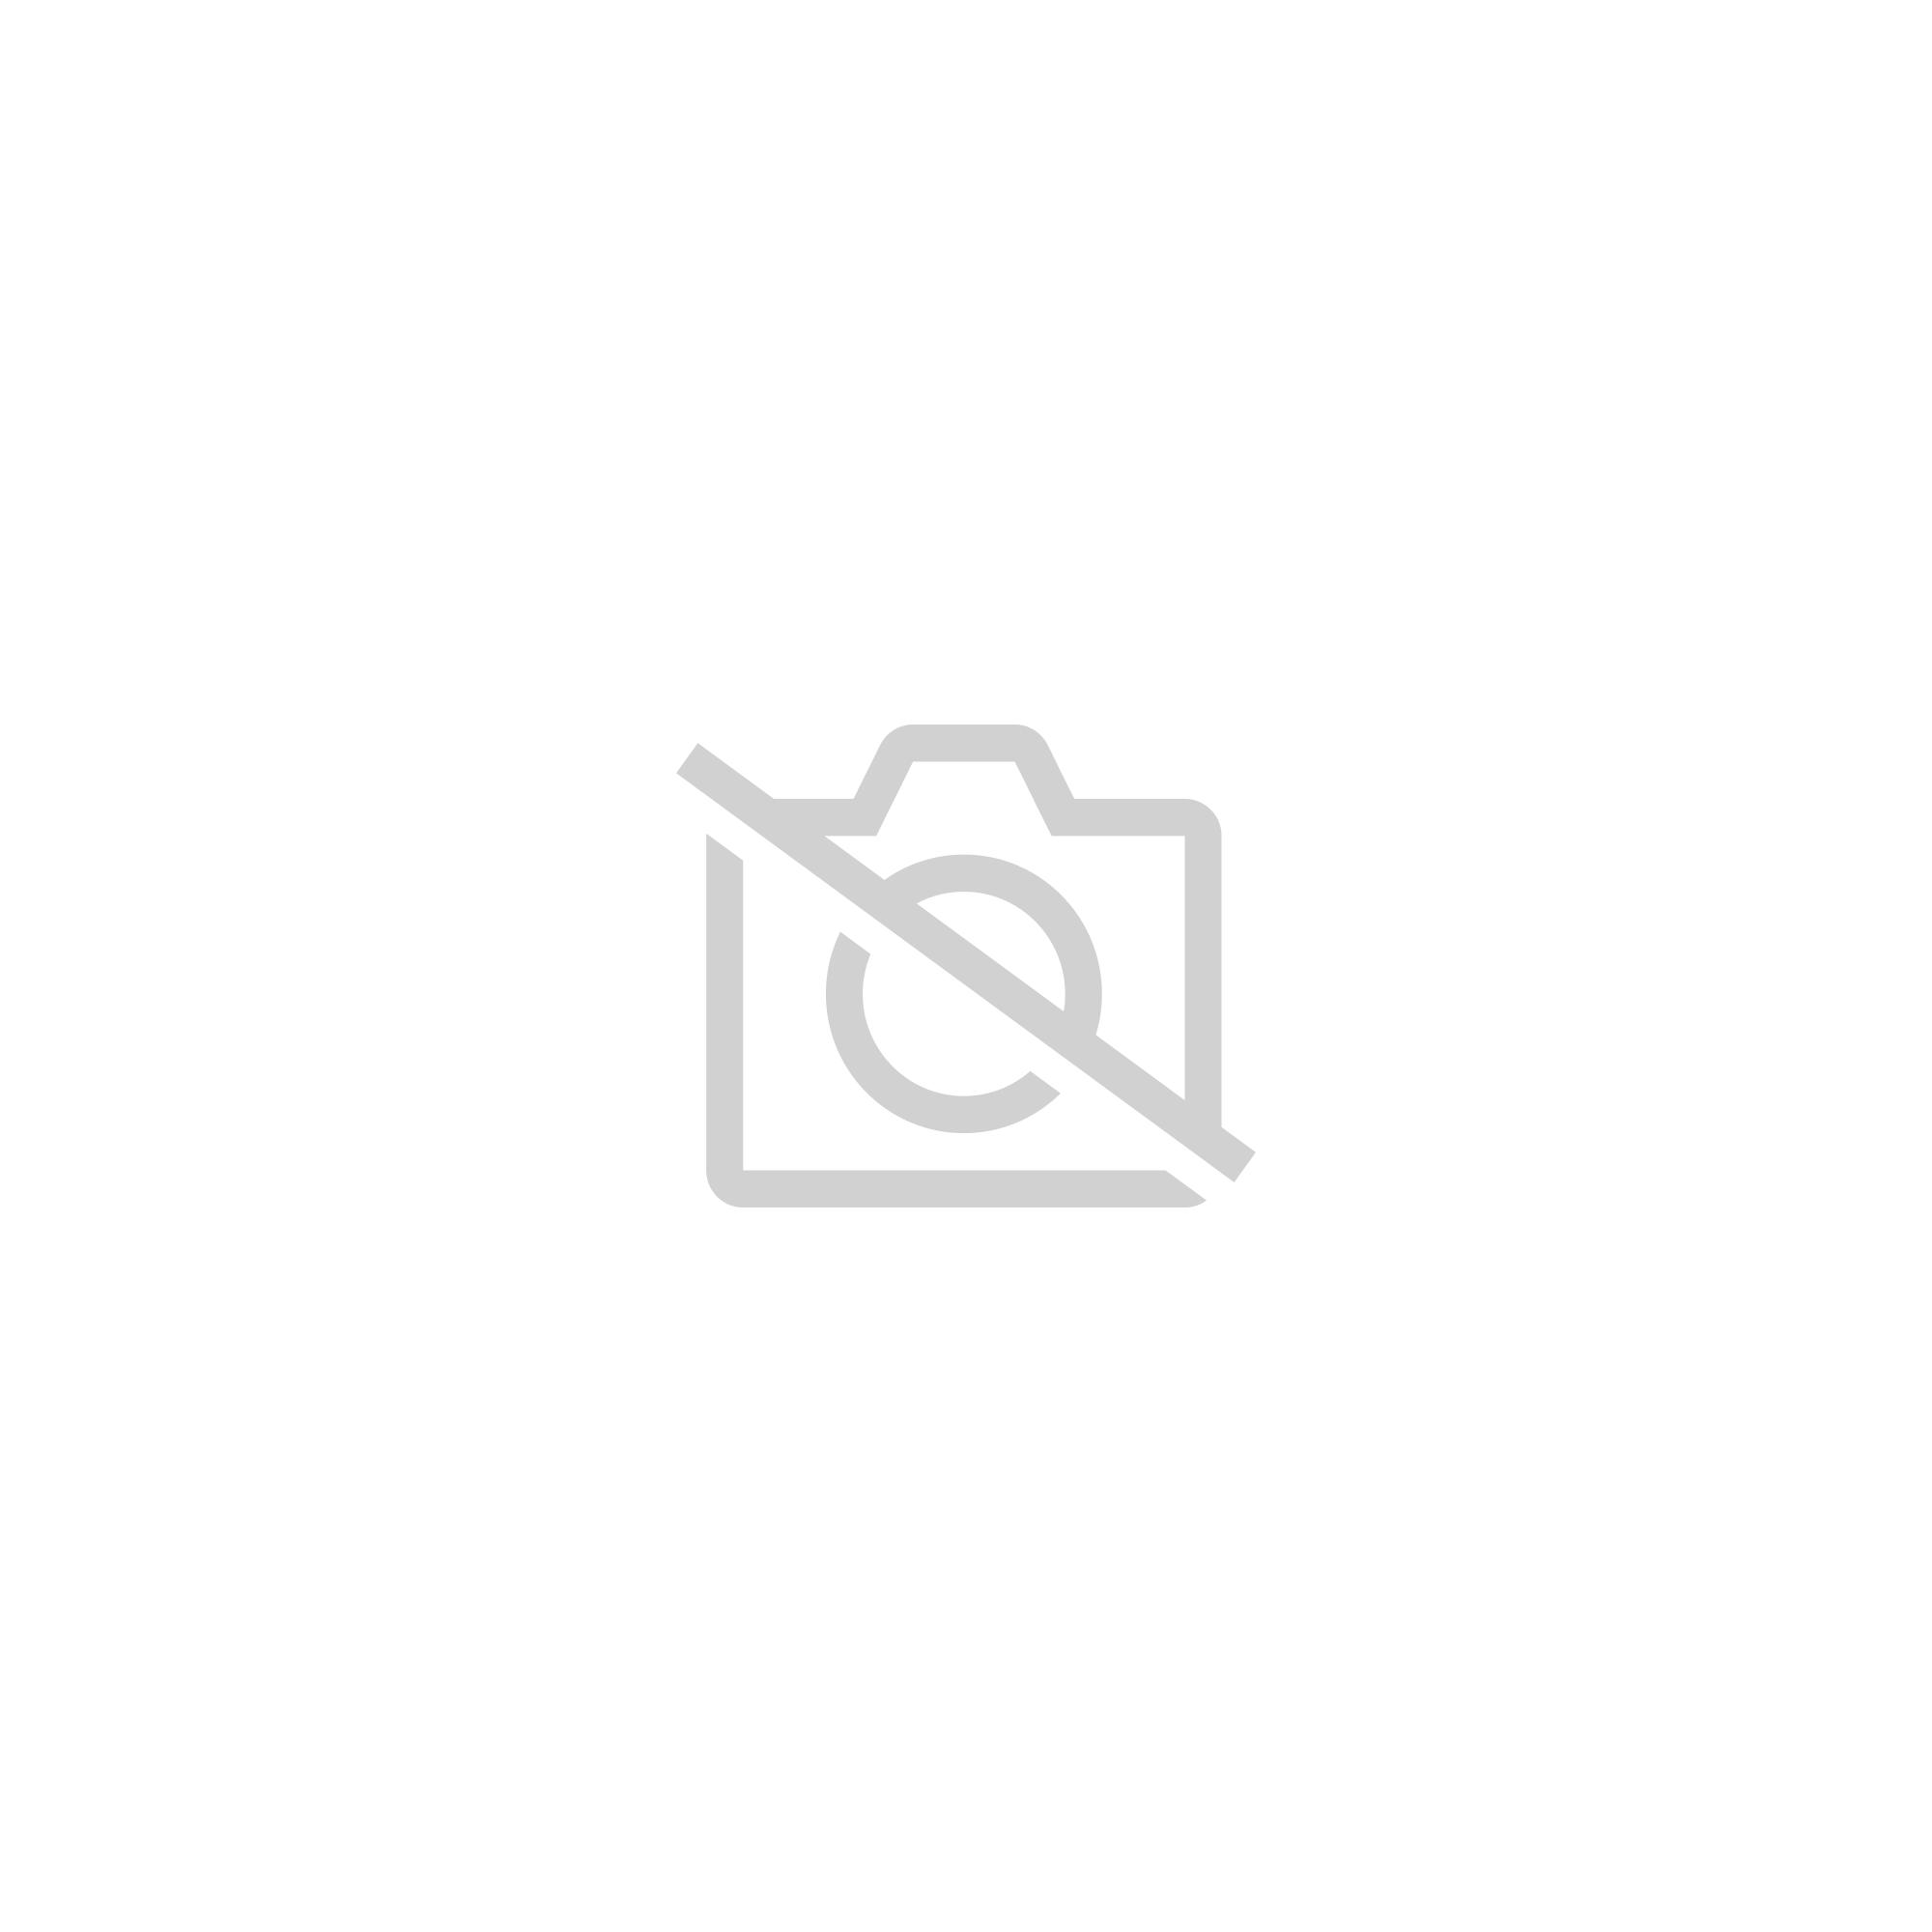 Babylonia - Bddbs 988 460 - Echarpe De Portage - Slen - Tapenade 0d9c830eb98